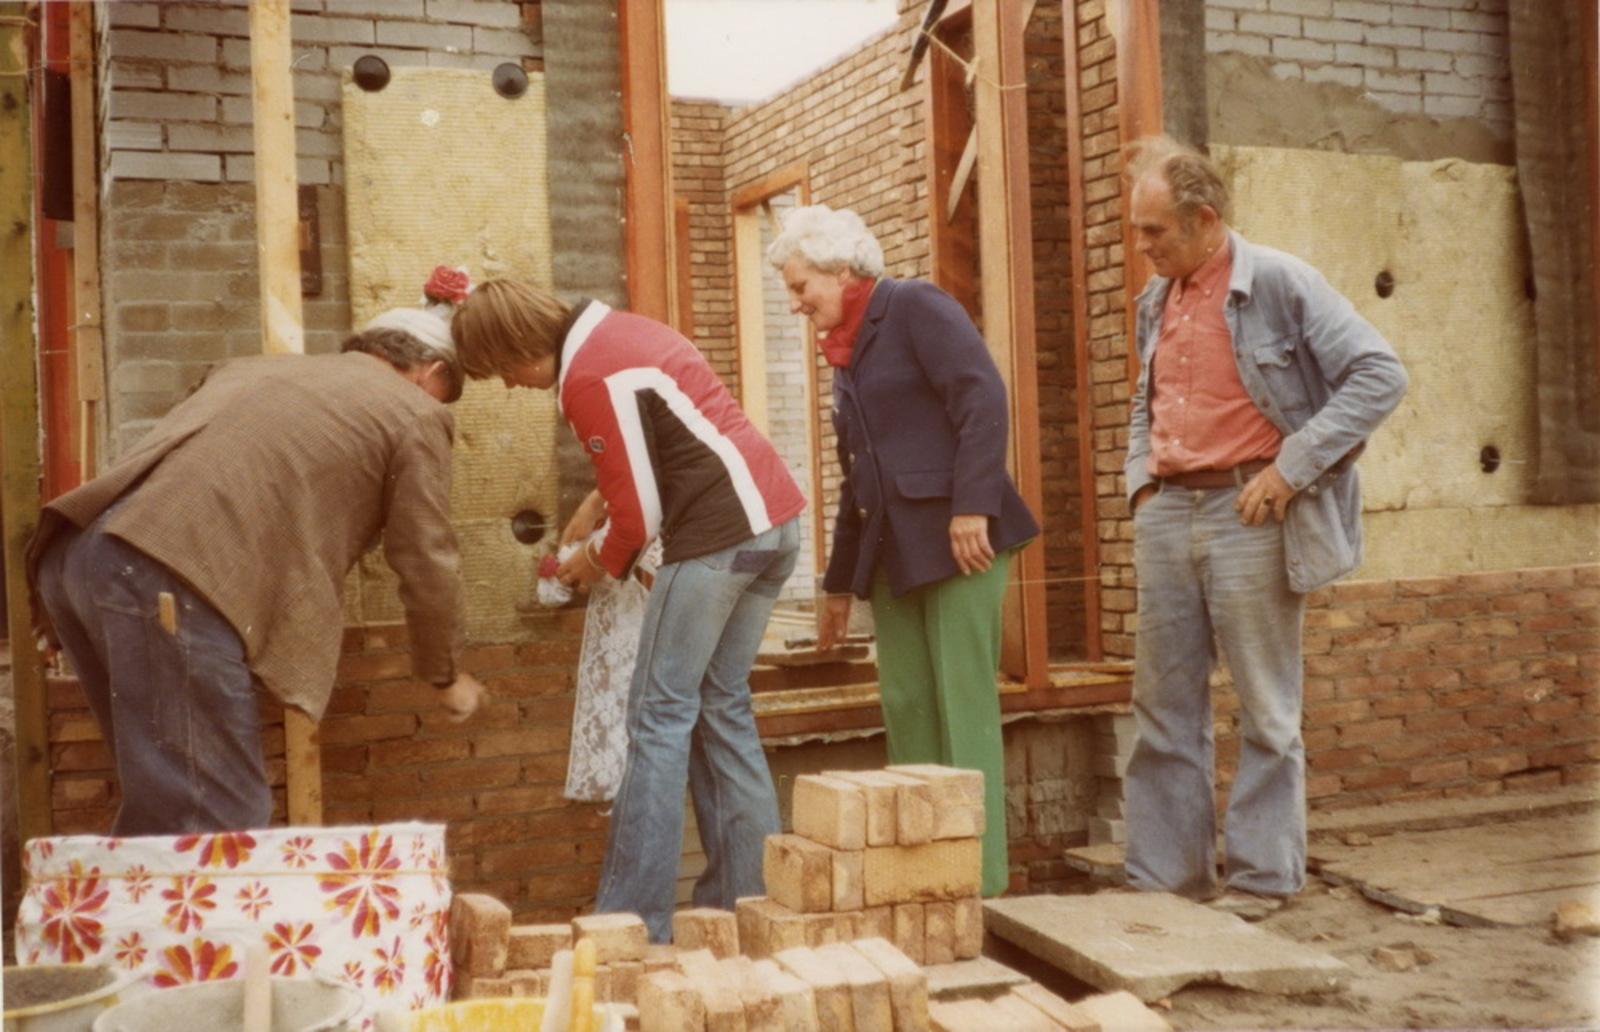 Marktplein N 0037 1978 Nieuwbouw huize aannemer den Ouden 05